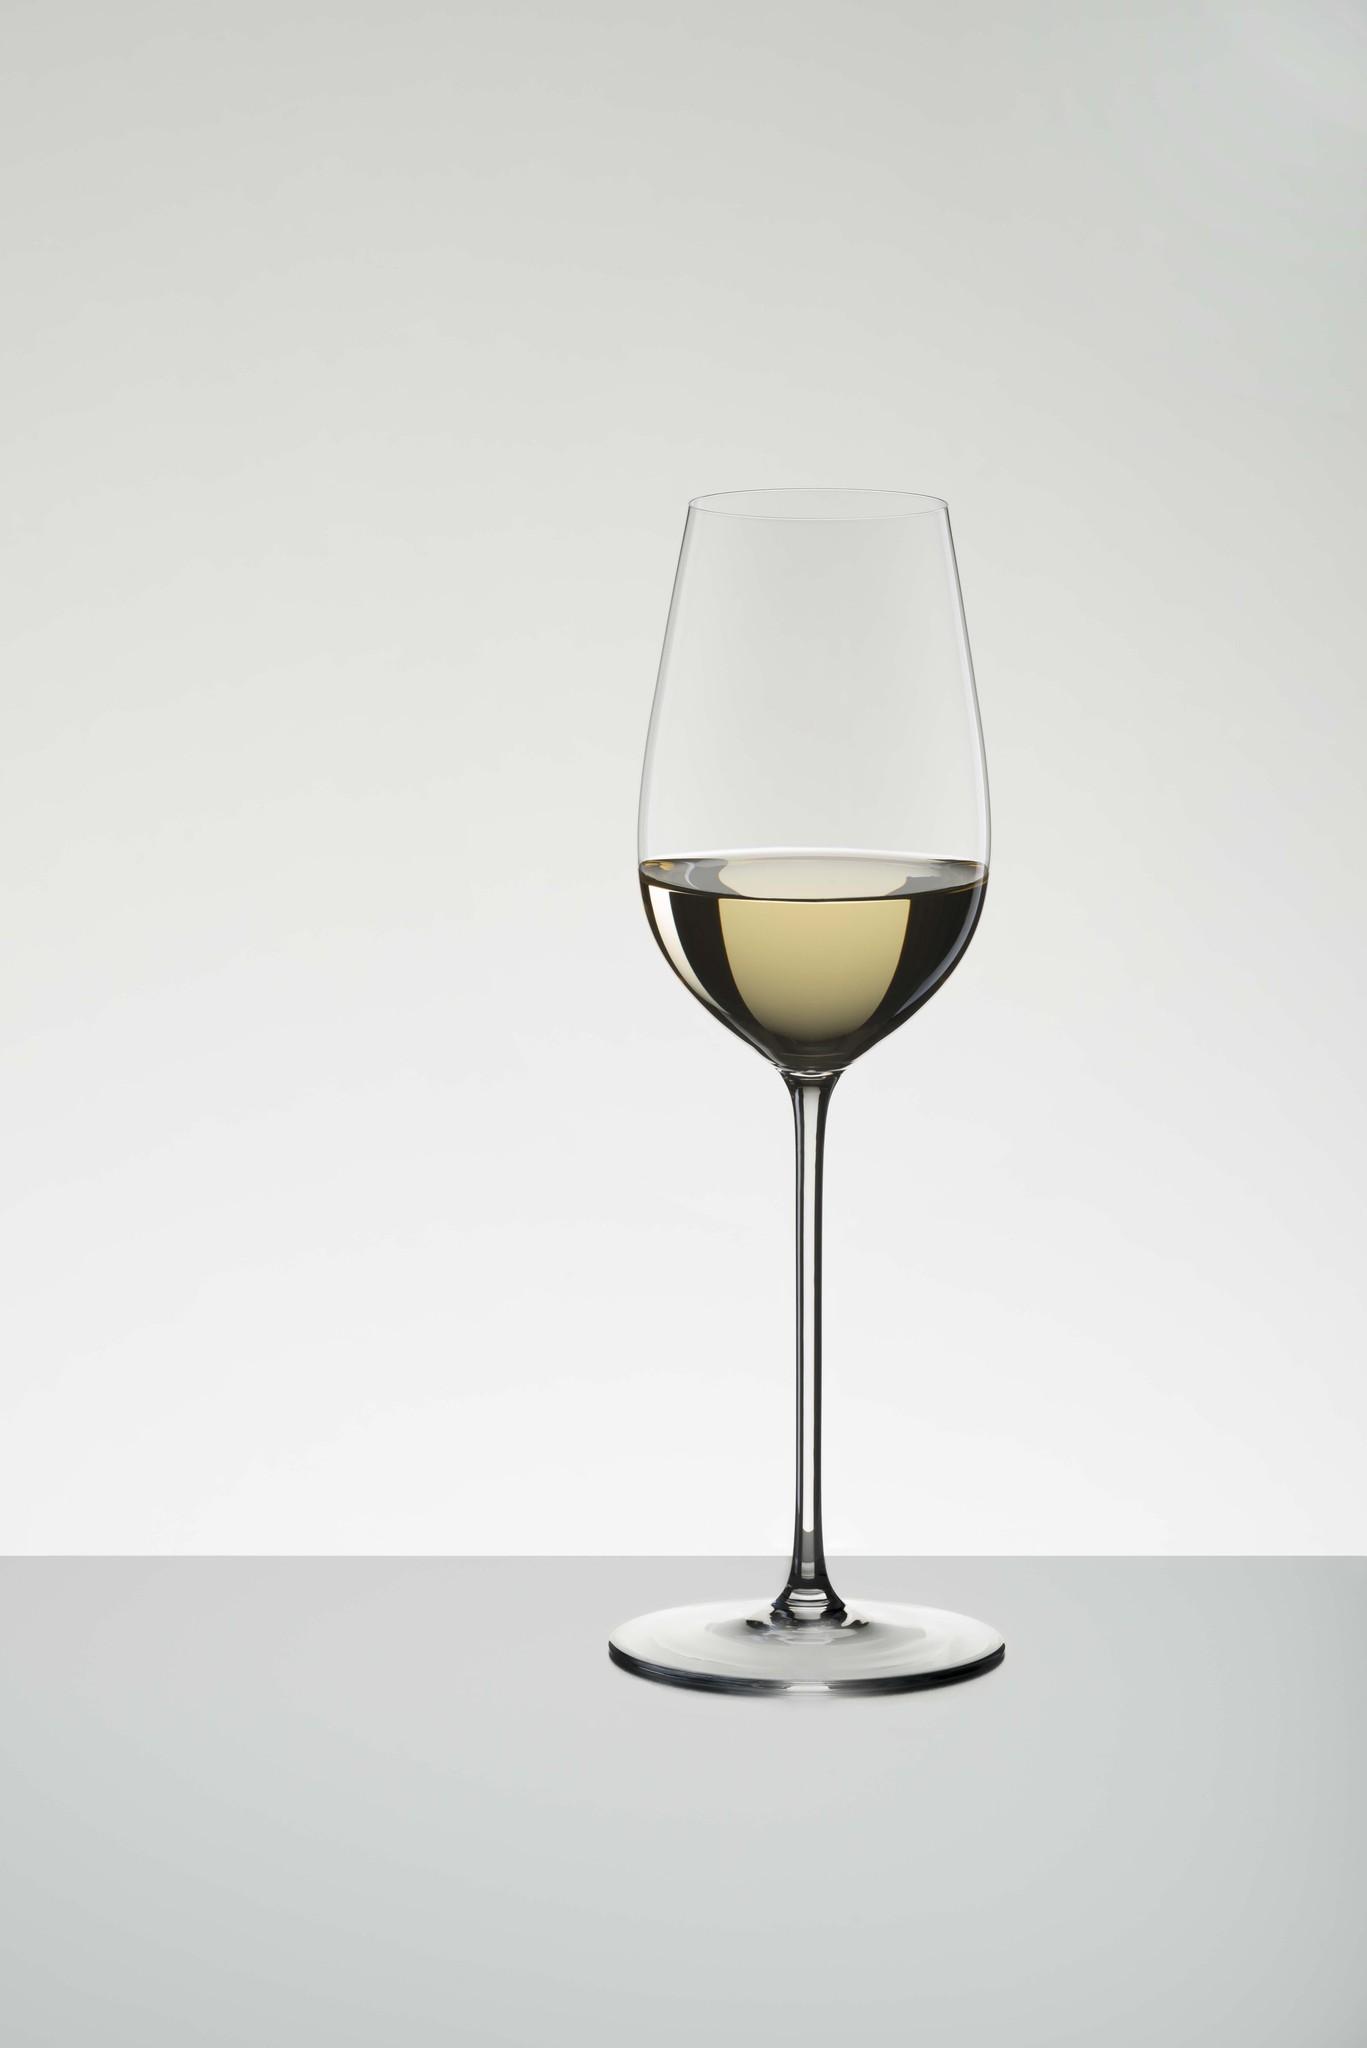 Бокалы Бокал для вина 380мл Riedel Superleggero Riesling/Zinfandel bokal-dlya-vina-380ml-riedel-superleggero-rieslingzinfandel-avstriya-beloe-vino-foto.jpg